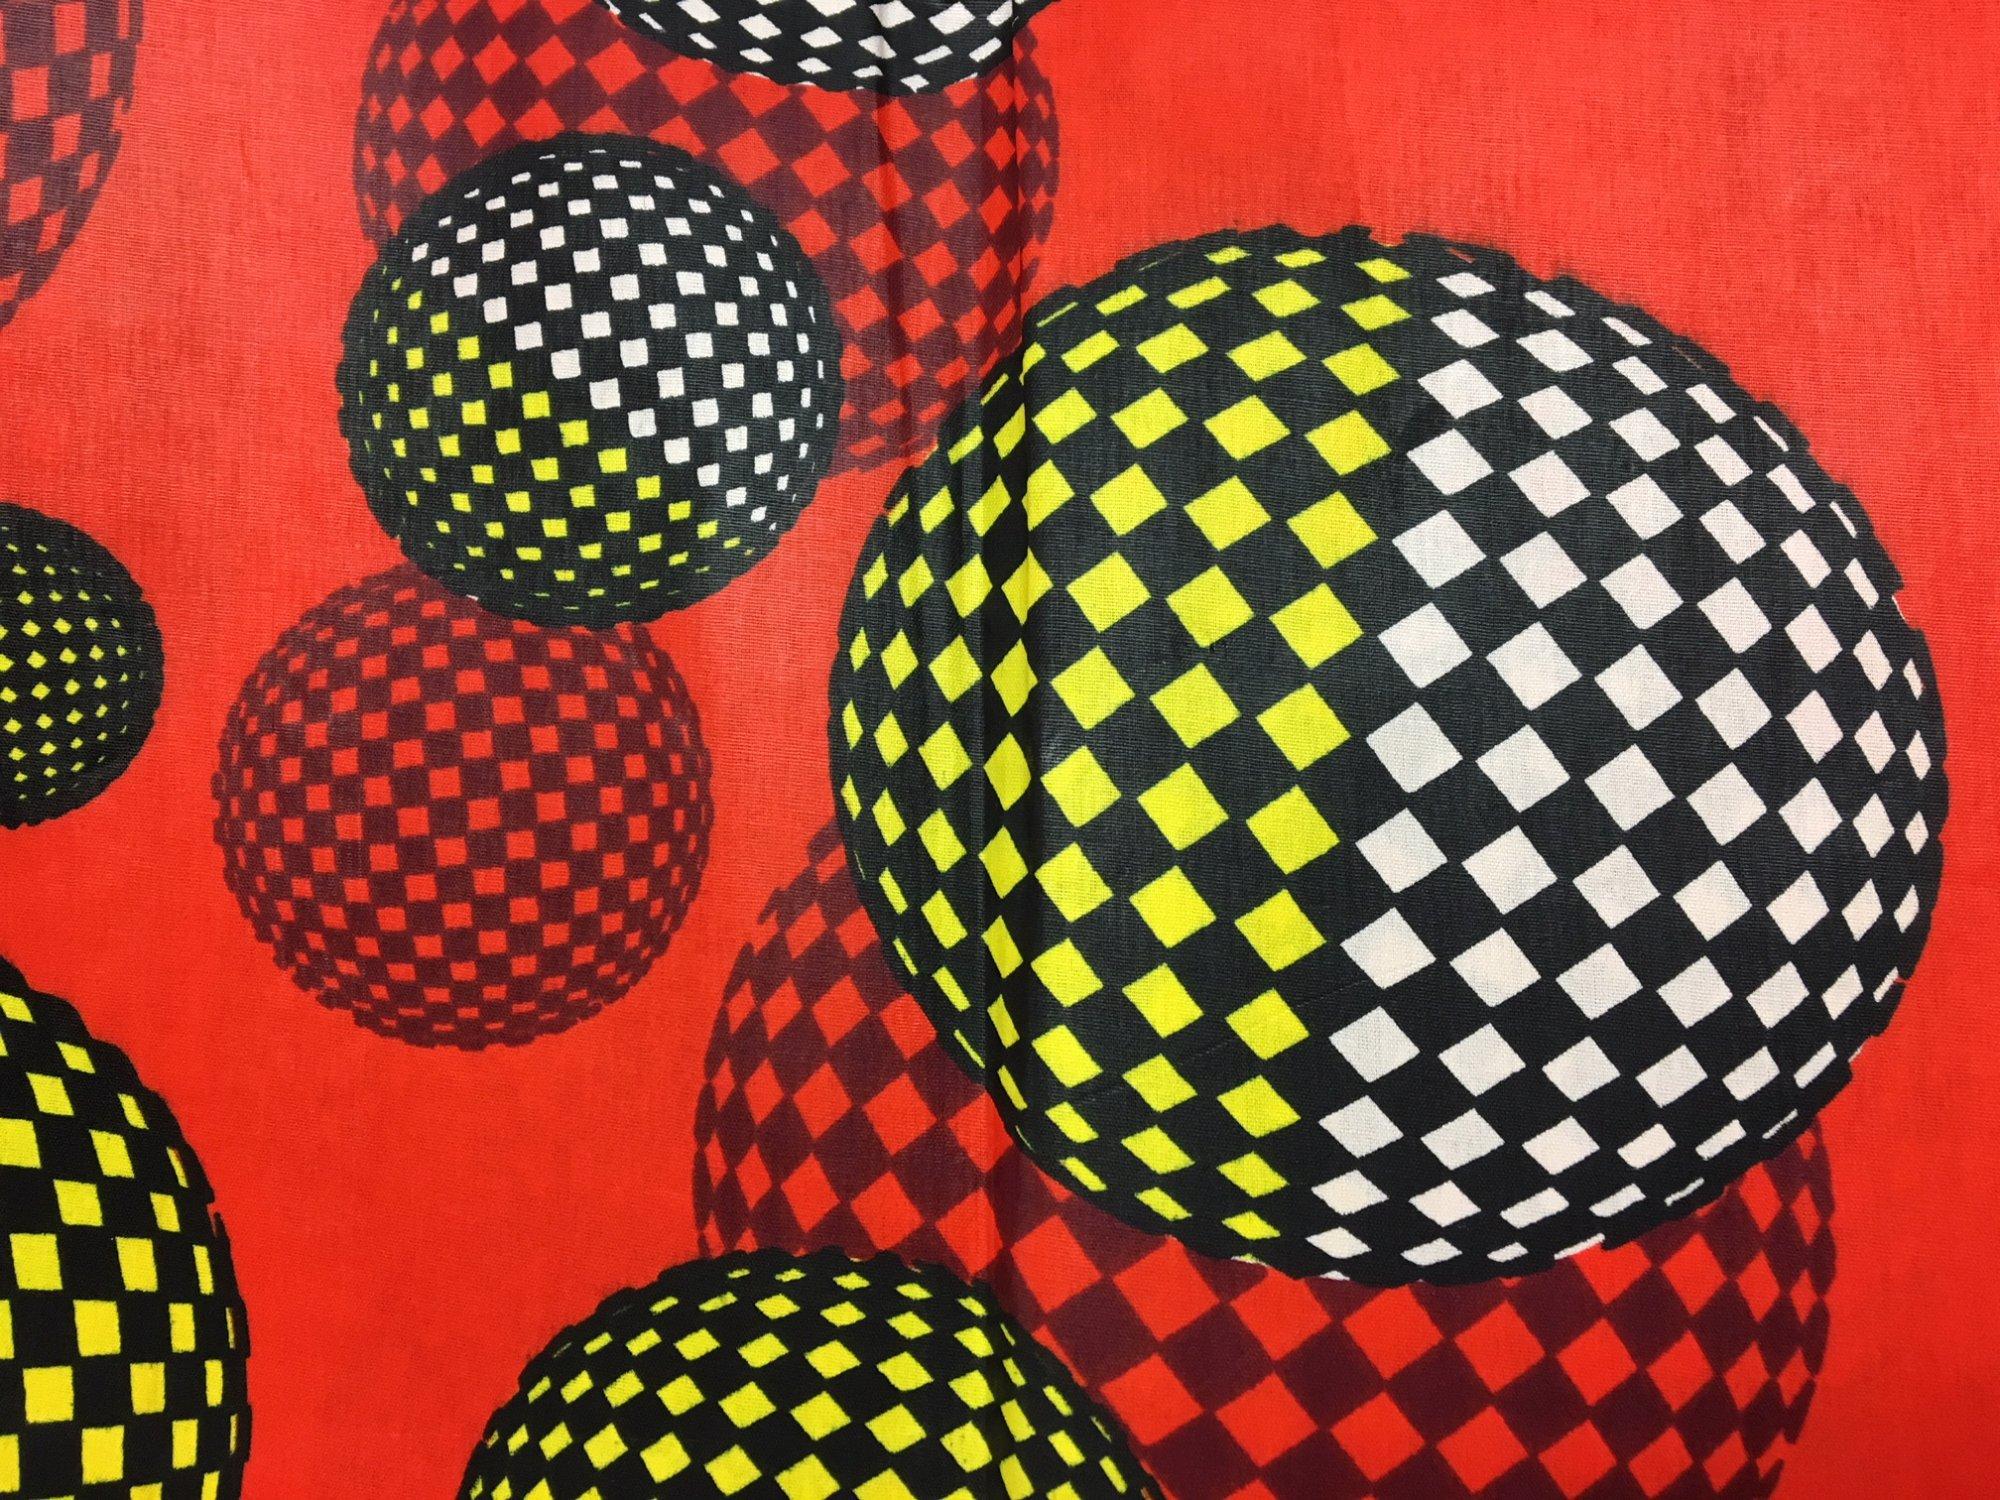 Orange with Black/White Sphere 708009